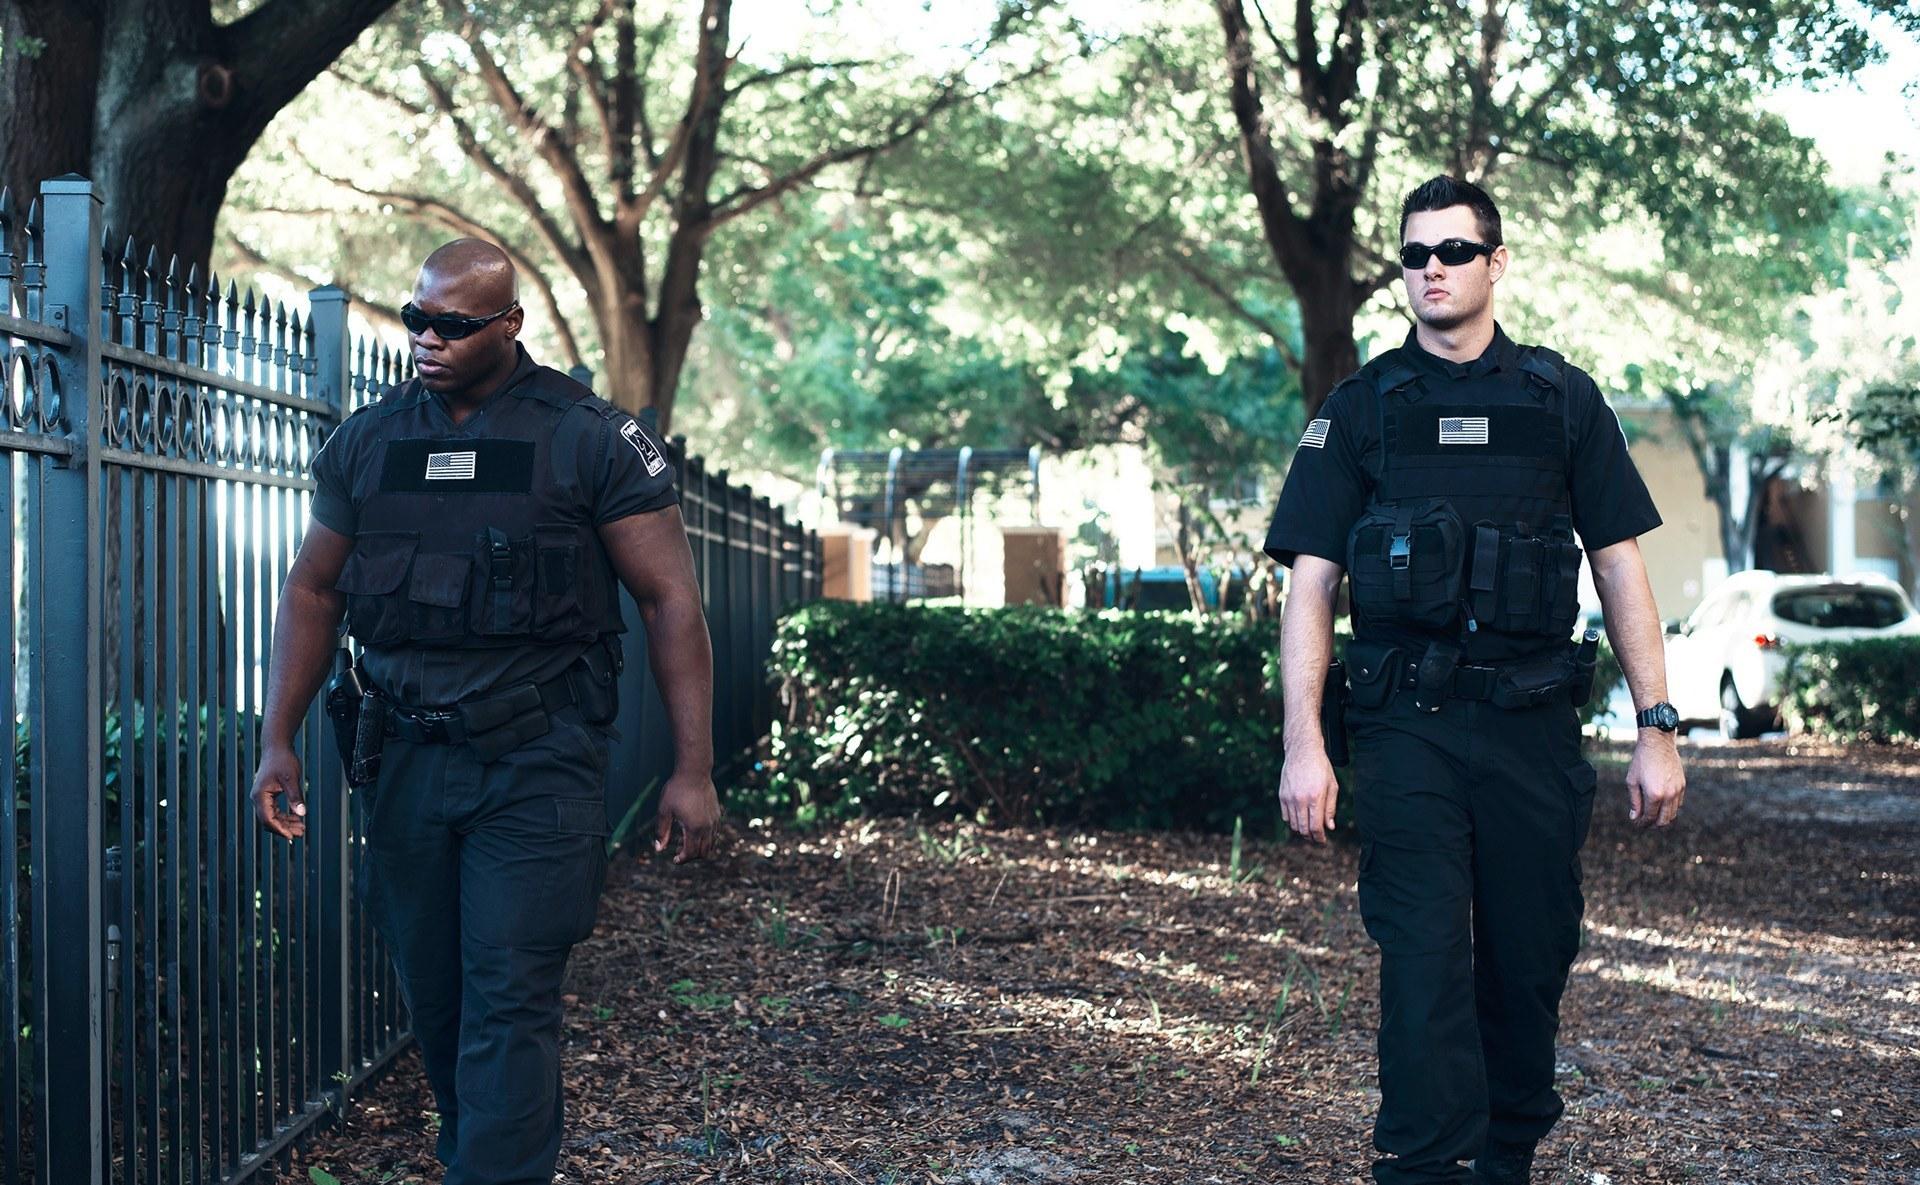 Armed Security Guard Services Orlando  Bodyguard Services